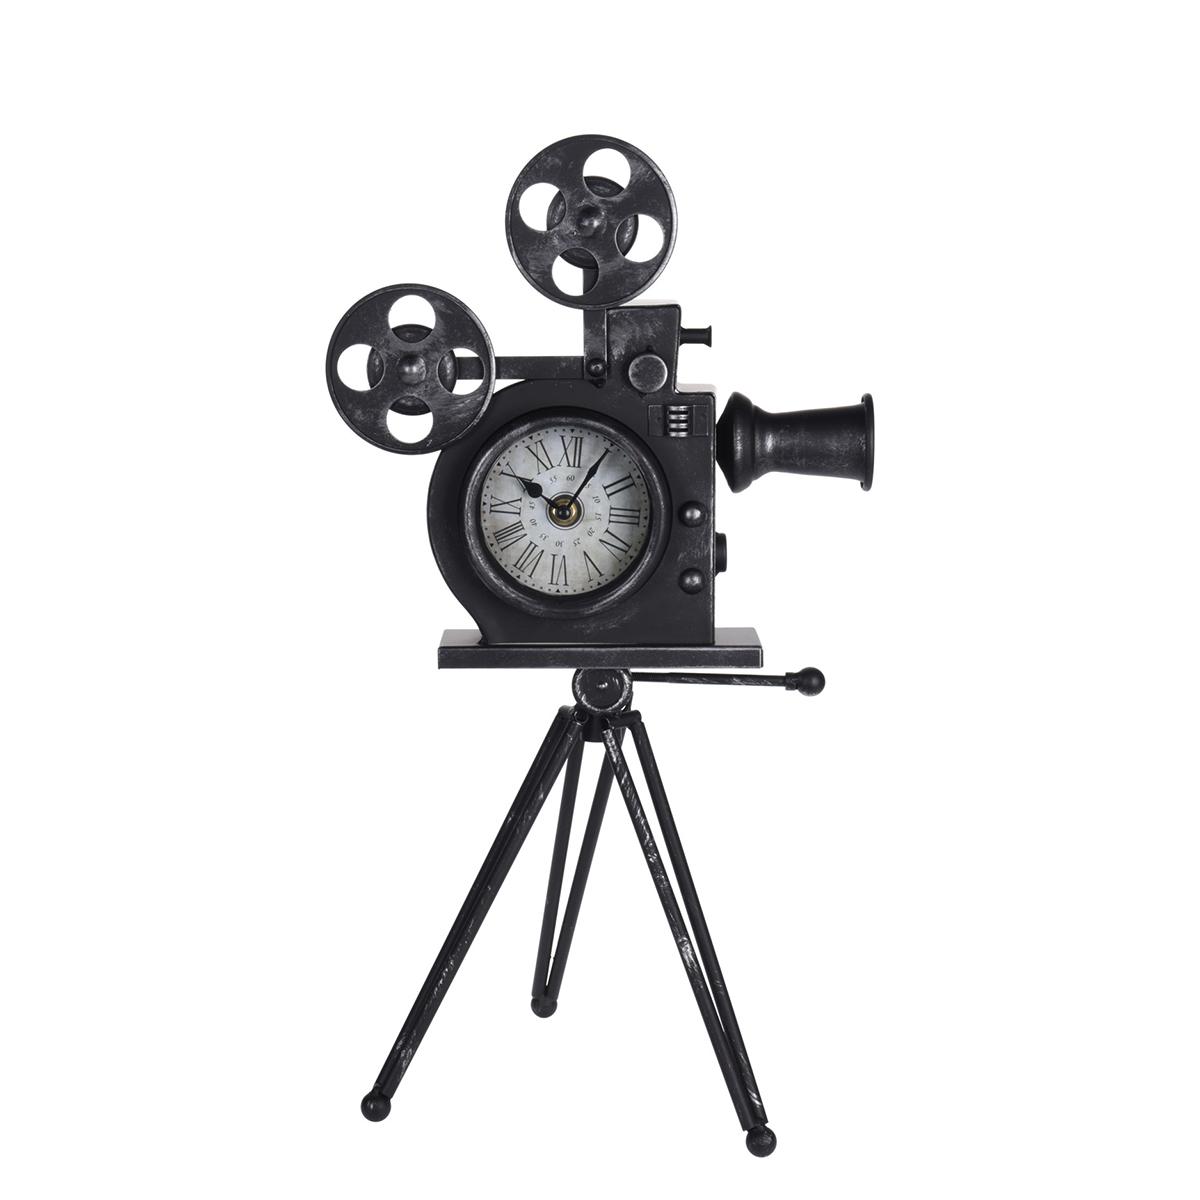 Horloge de table Muybridge 30x53cm Métal Noir